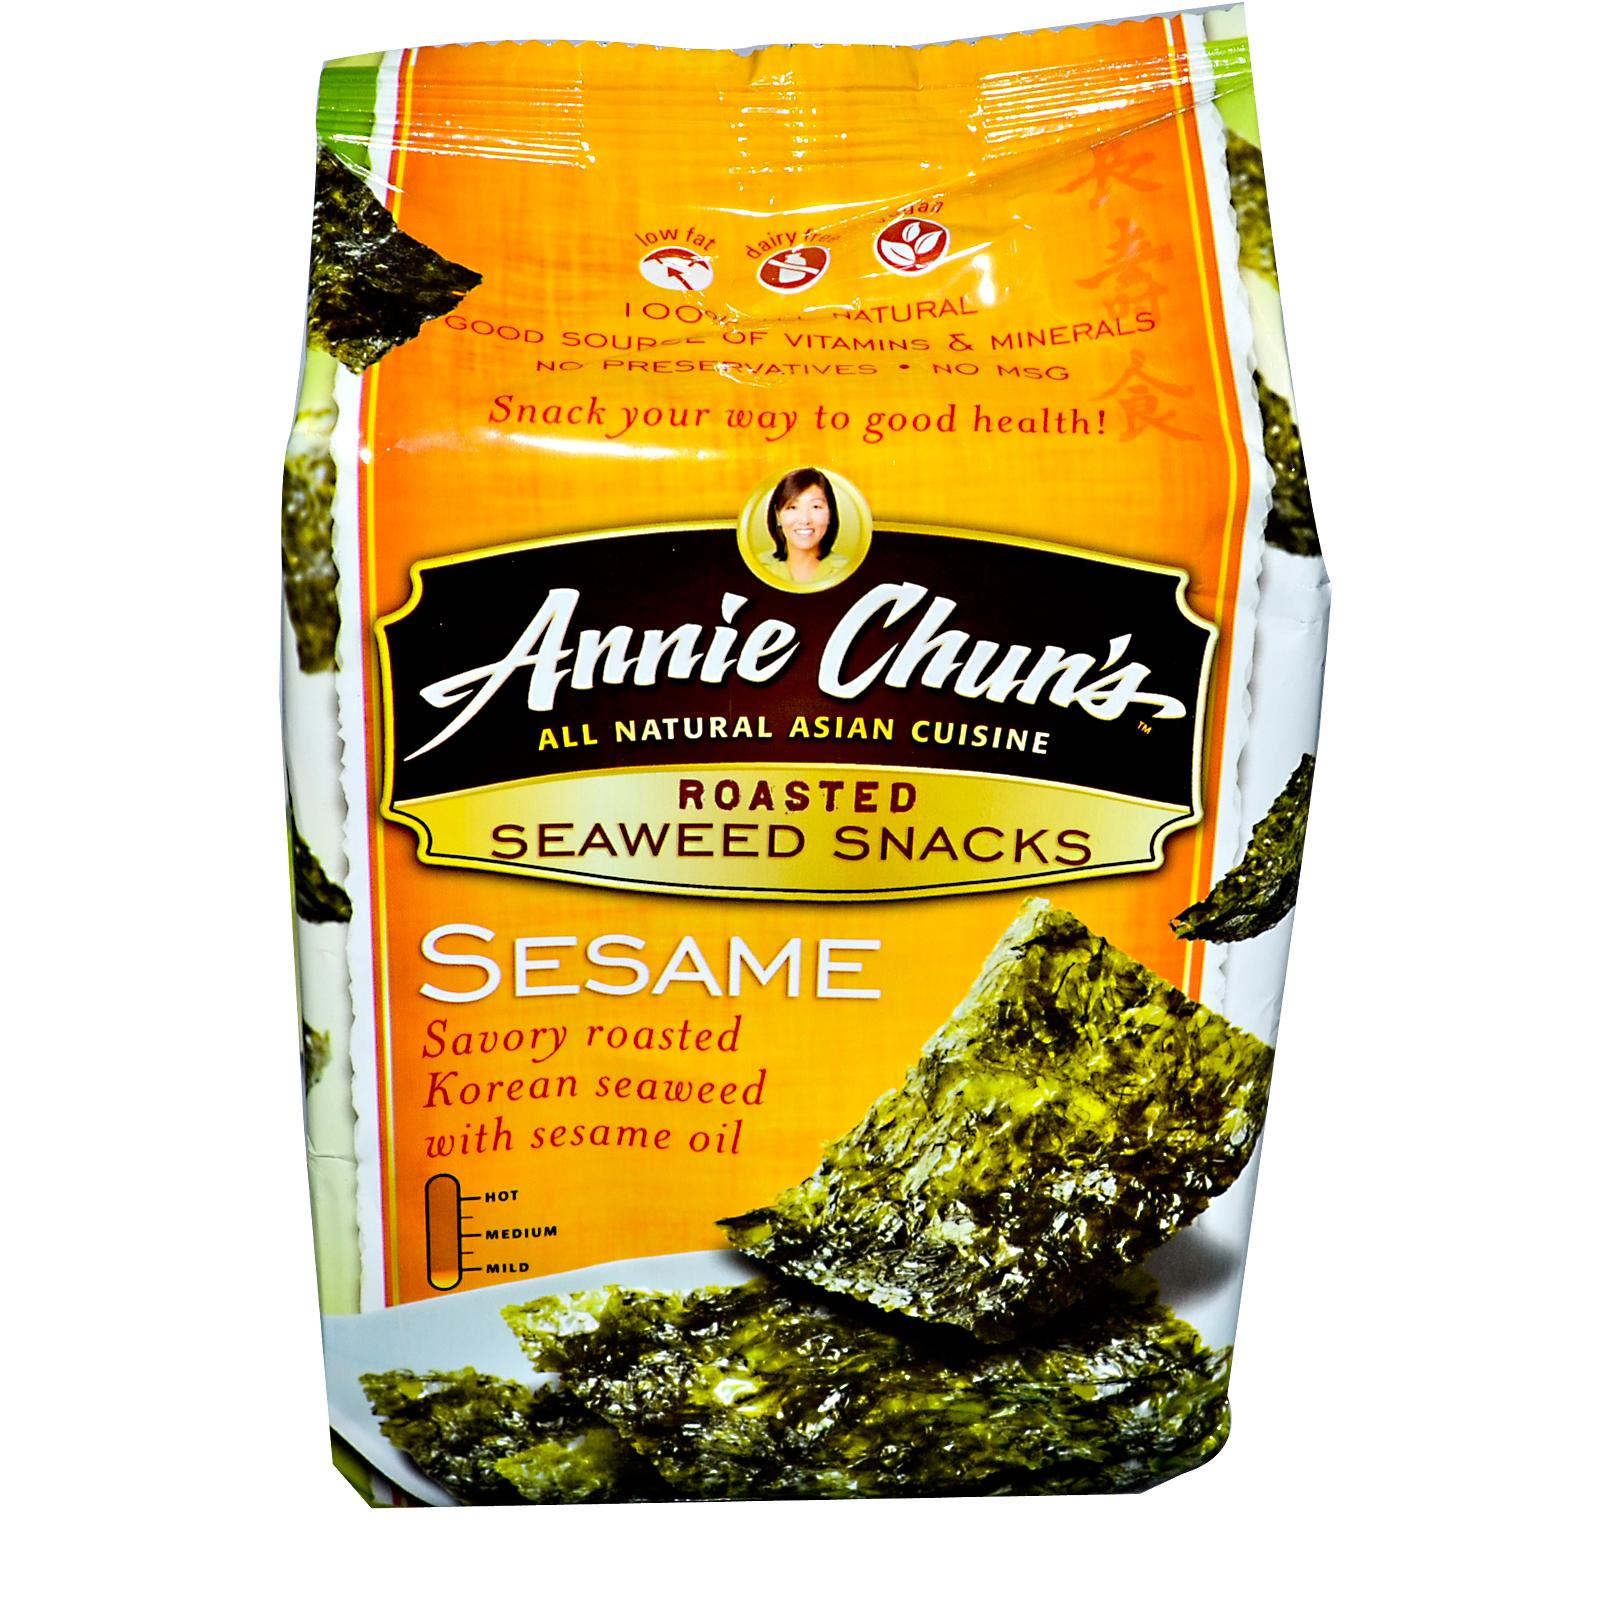 Annie Chun's Seaweed Snacks Roasted Sesame